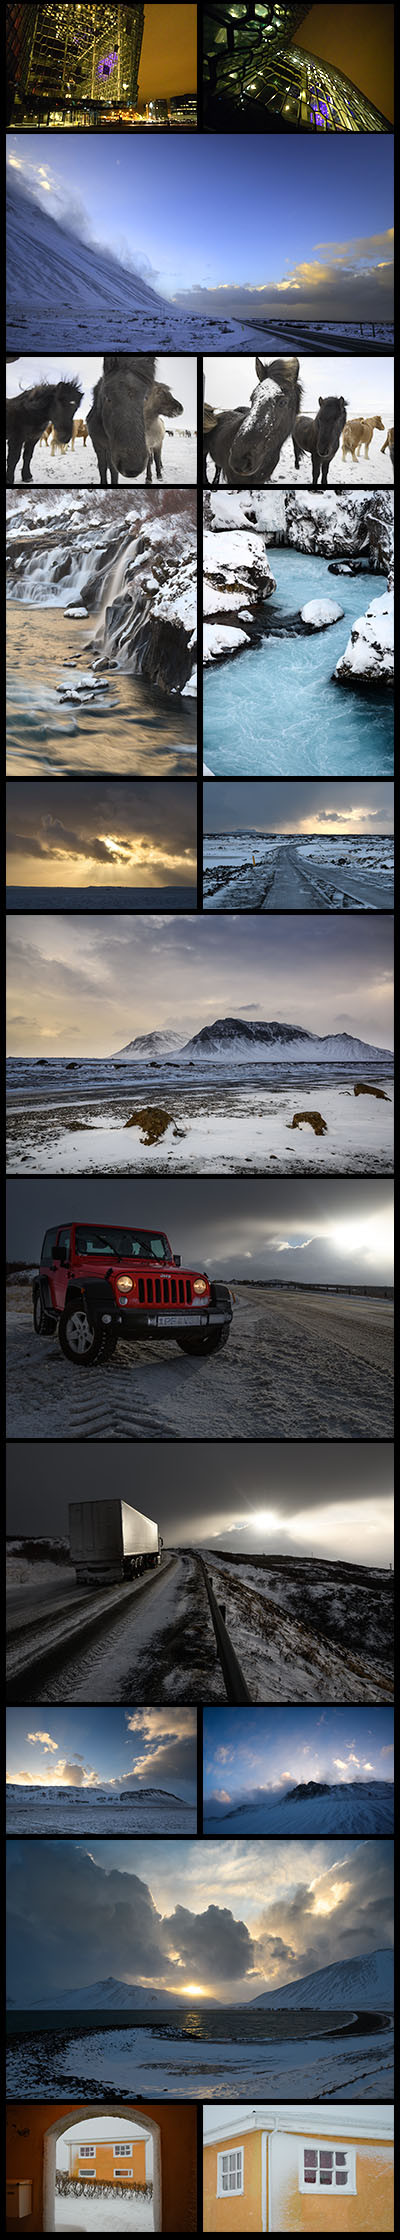 2018-Iceland-Day01-Stripe.jpg